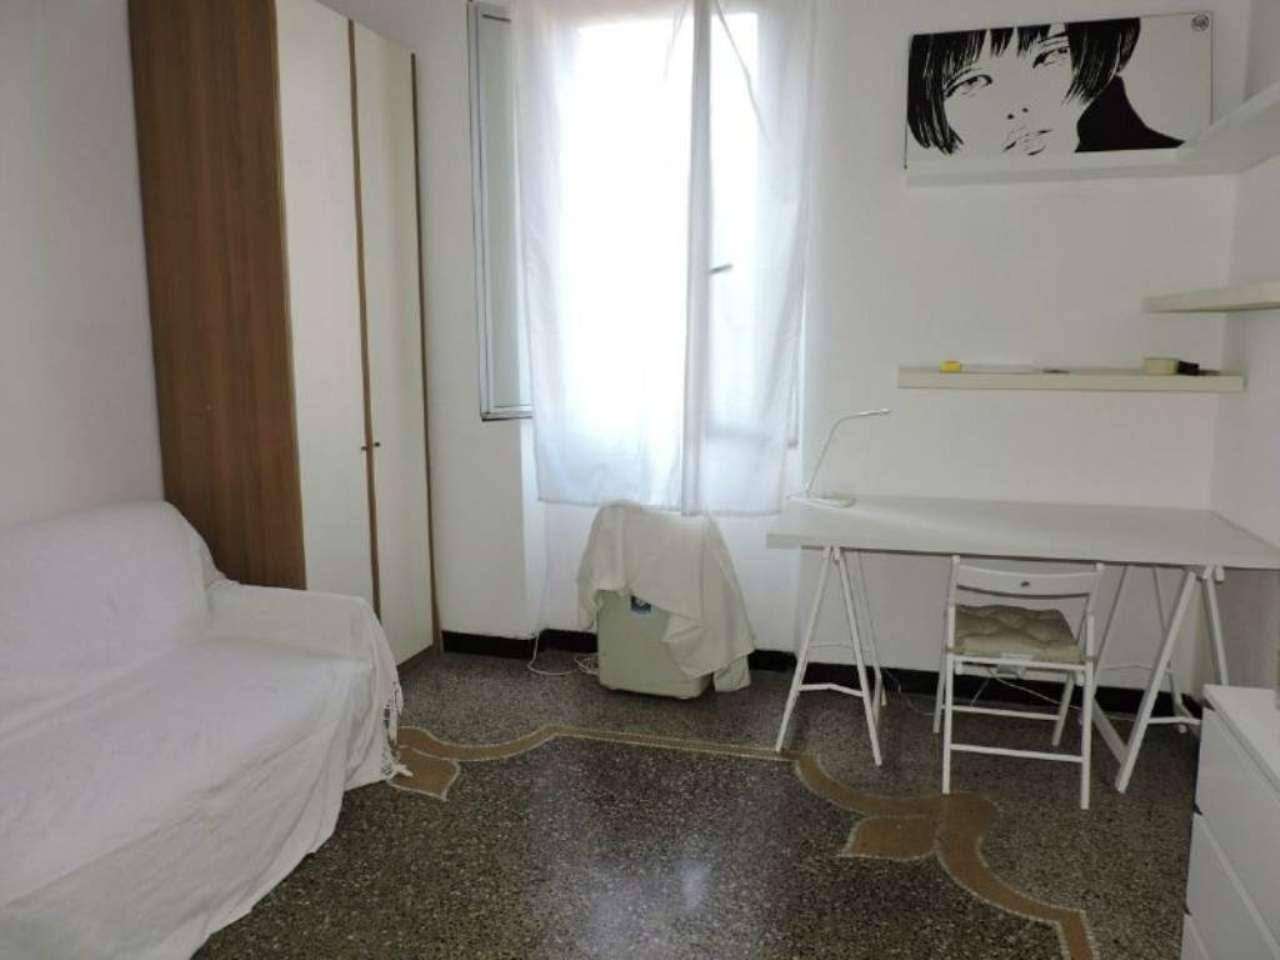 Bilocale Genova Via Dino Col 9